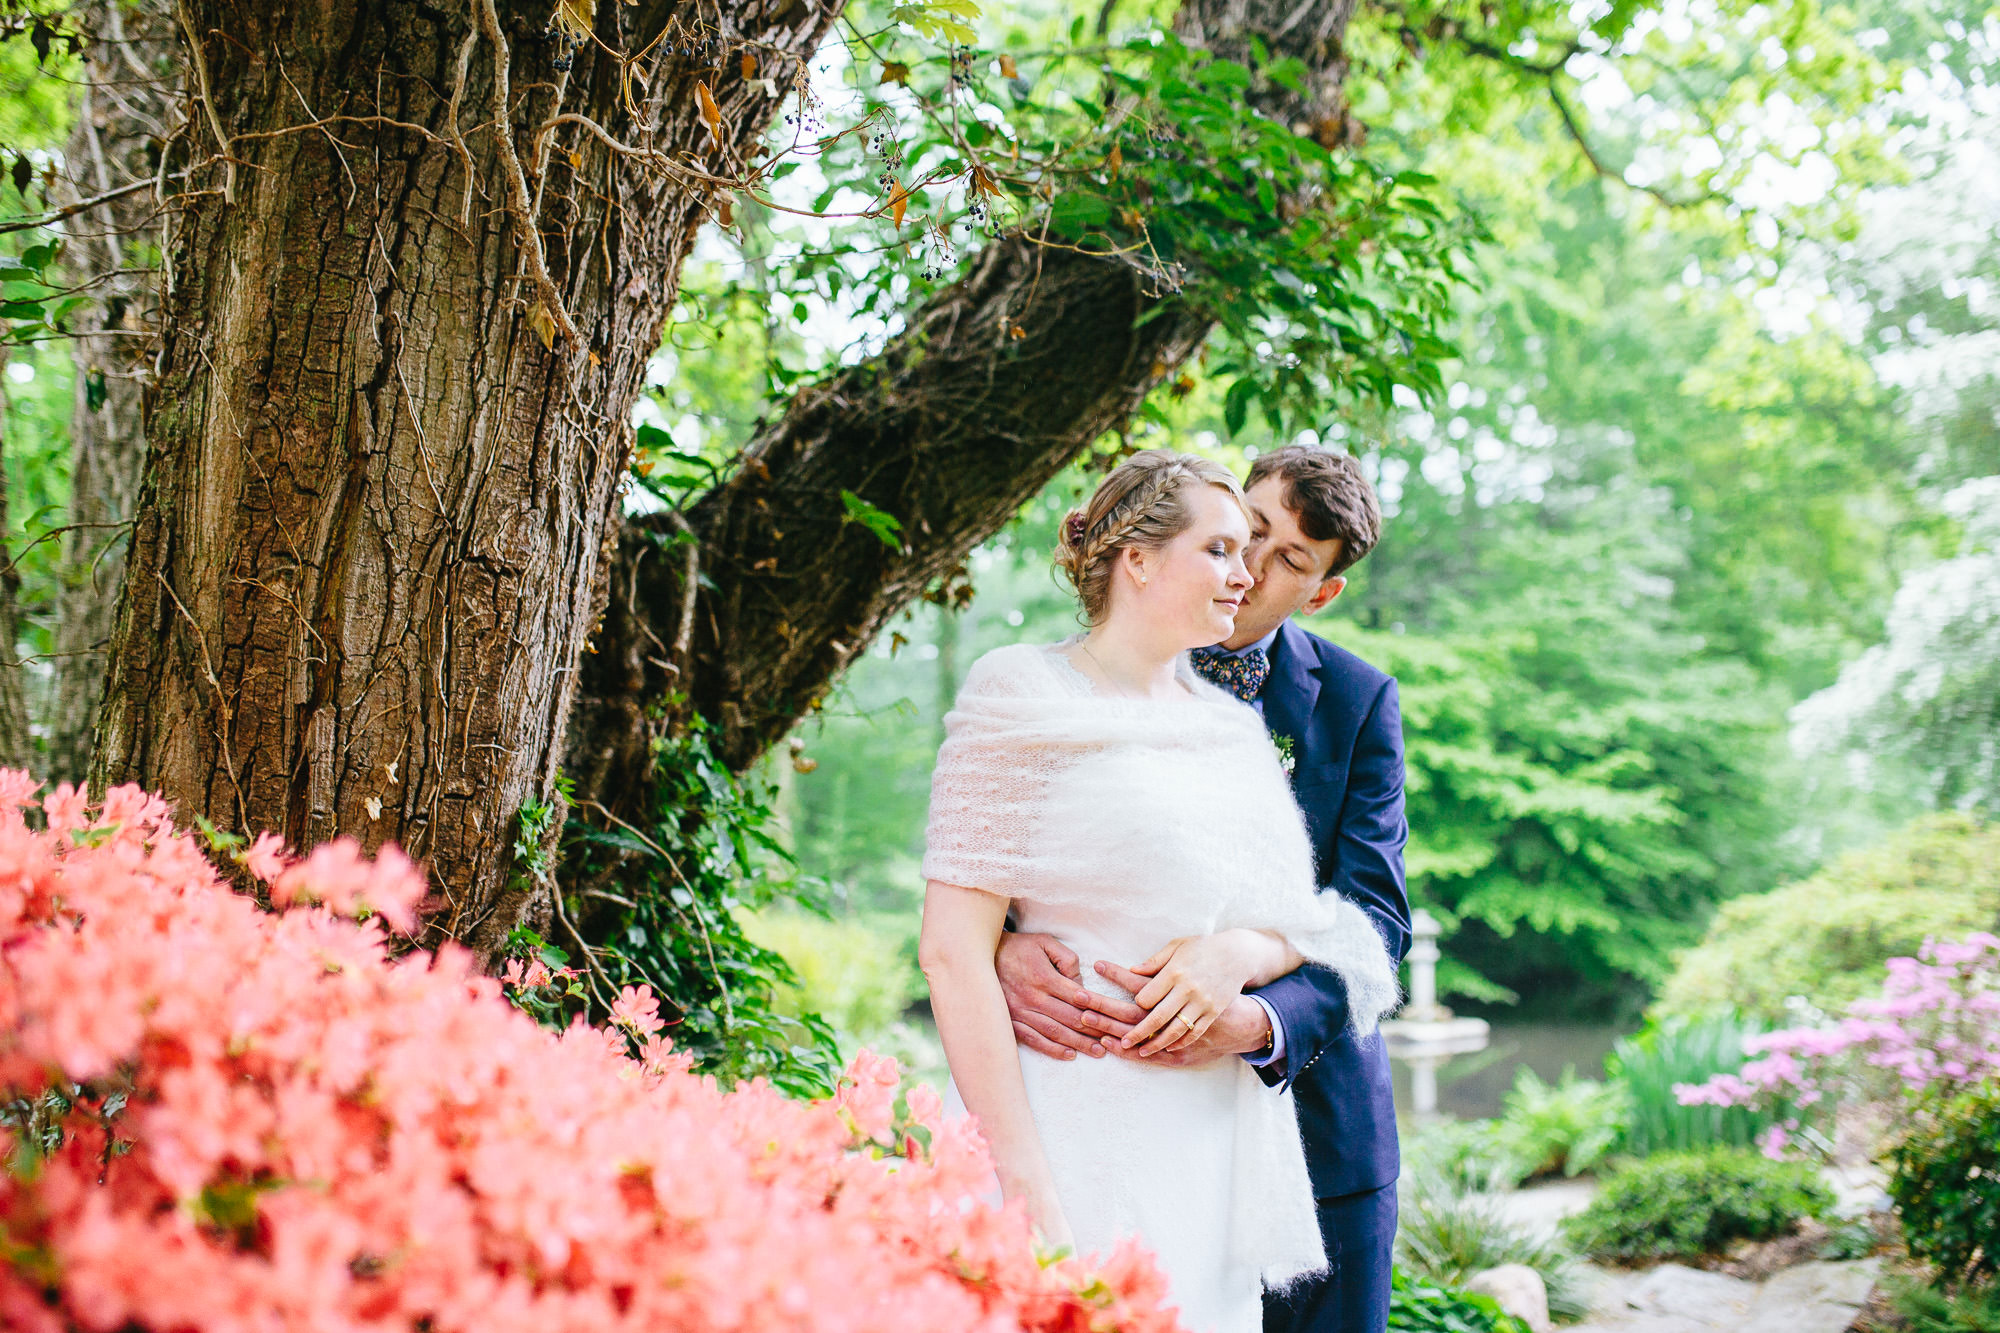 Kati & Peter - Hochzeitsfotograf  Bremen Botanika